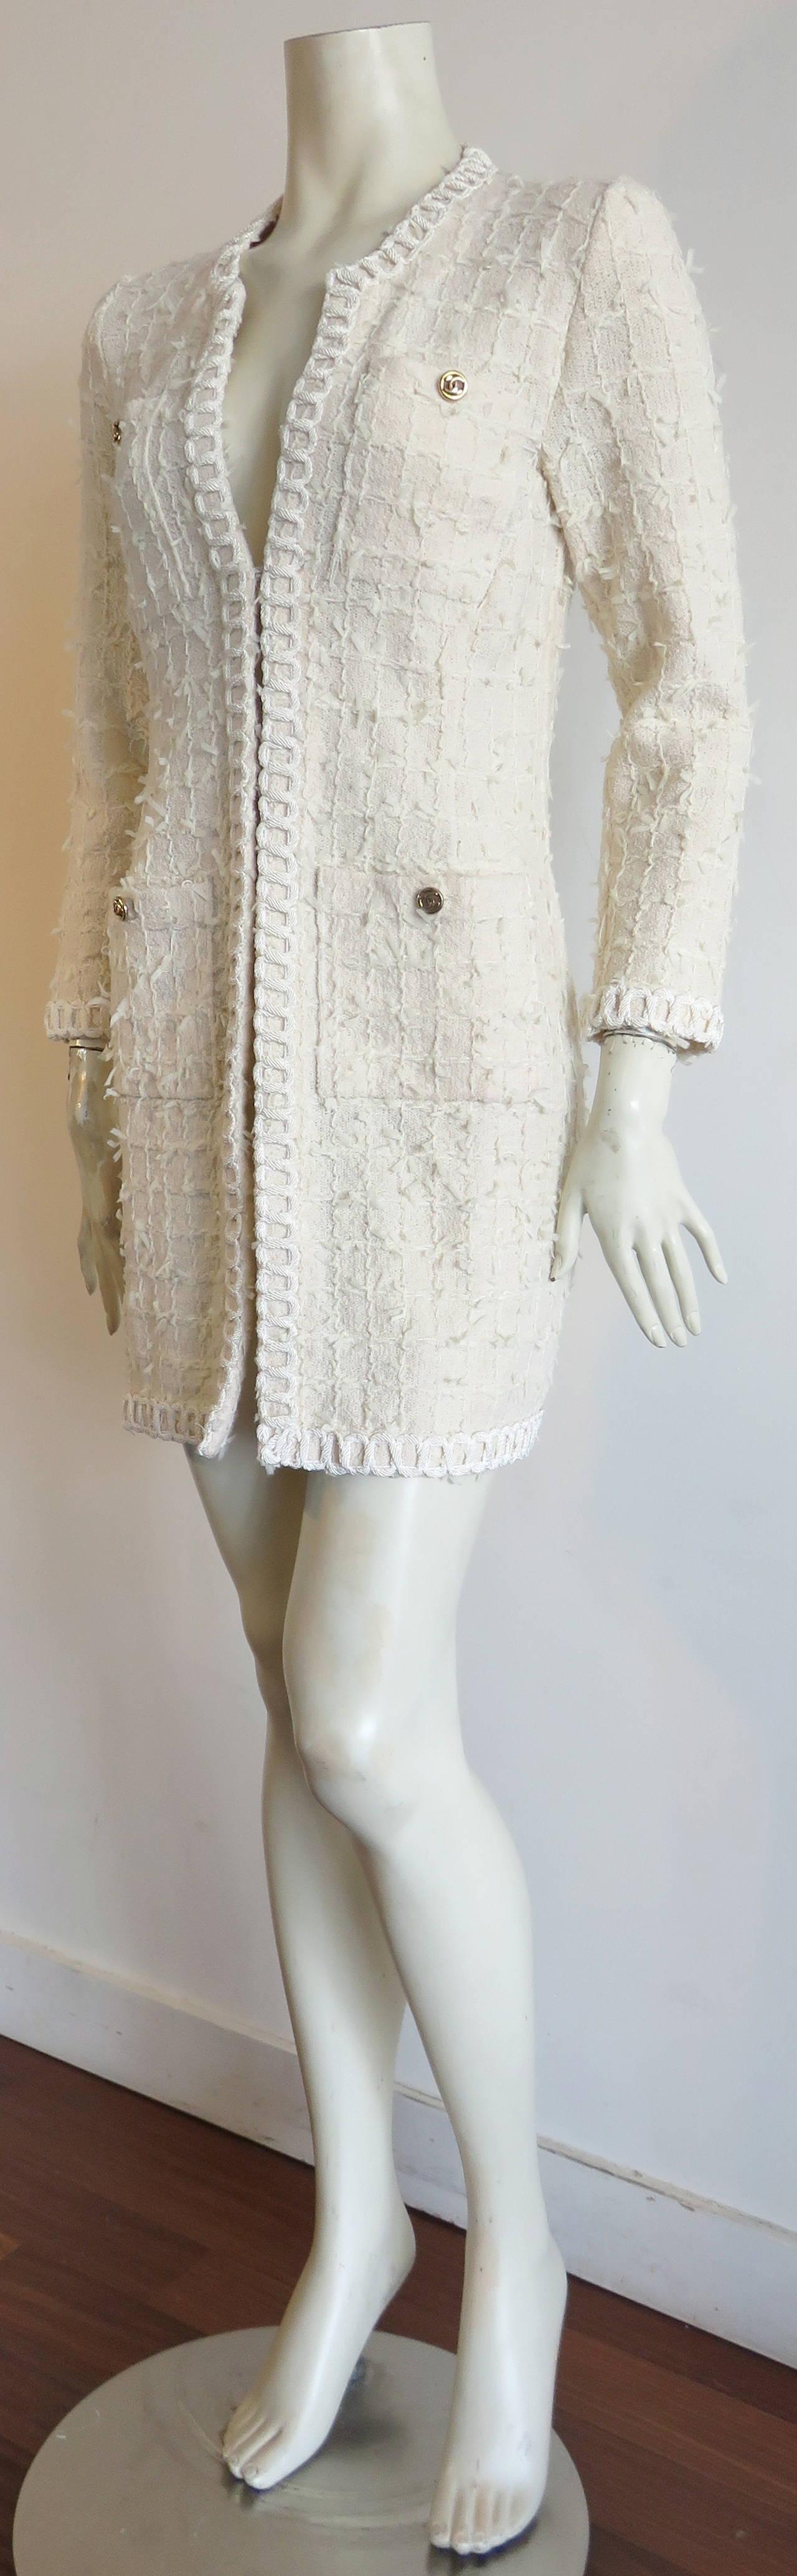 1980s CHANEL PARIS Ivory knit long cardigan at 1stdibs